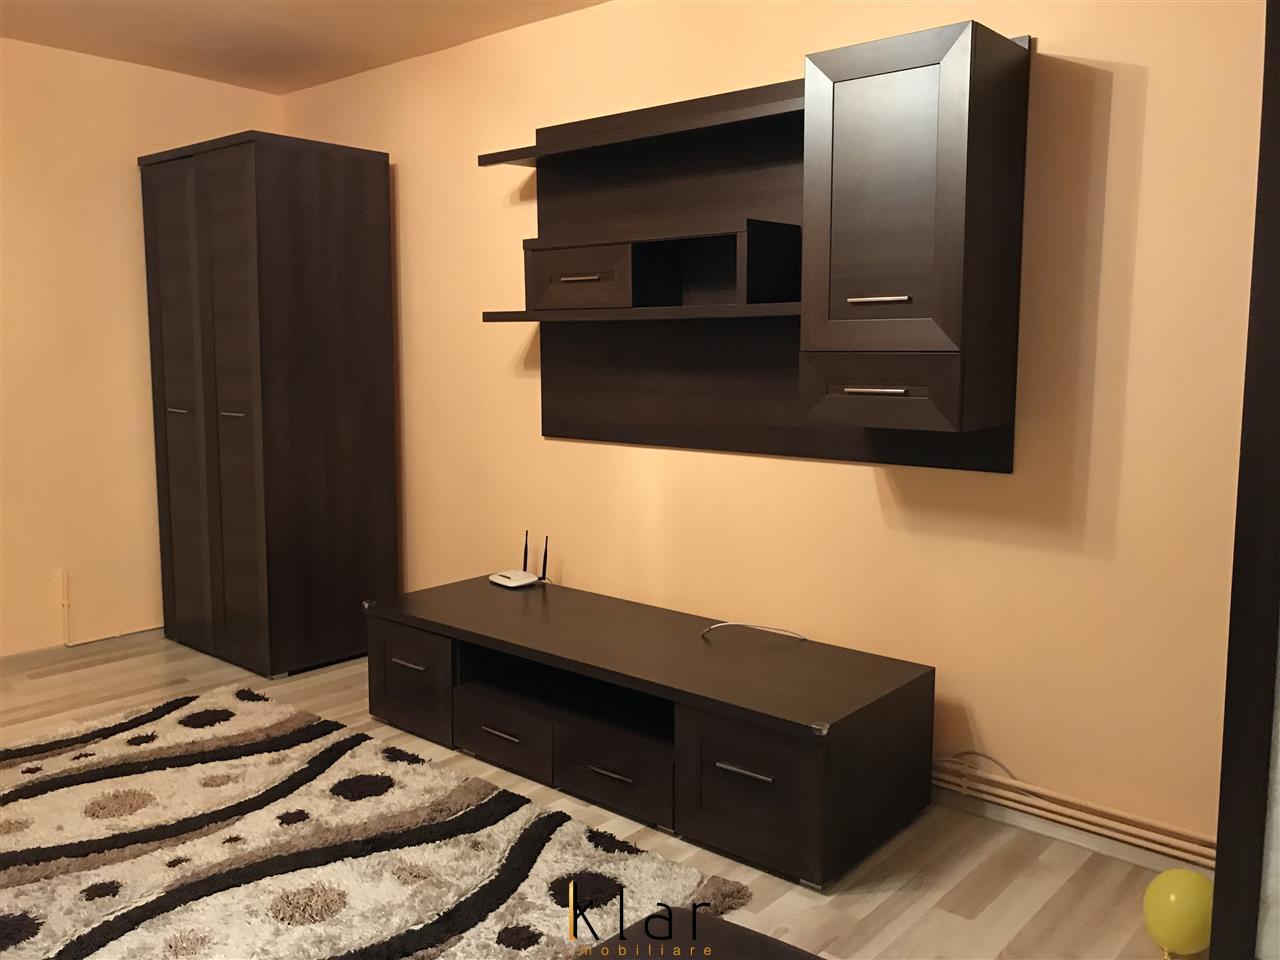 Inchiriere apartament 3 camere Piata Marasti !!!